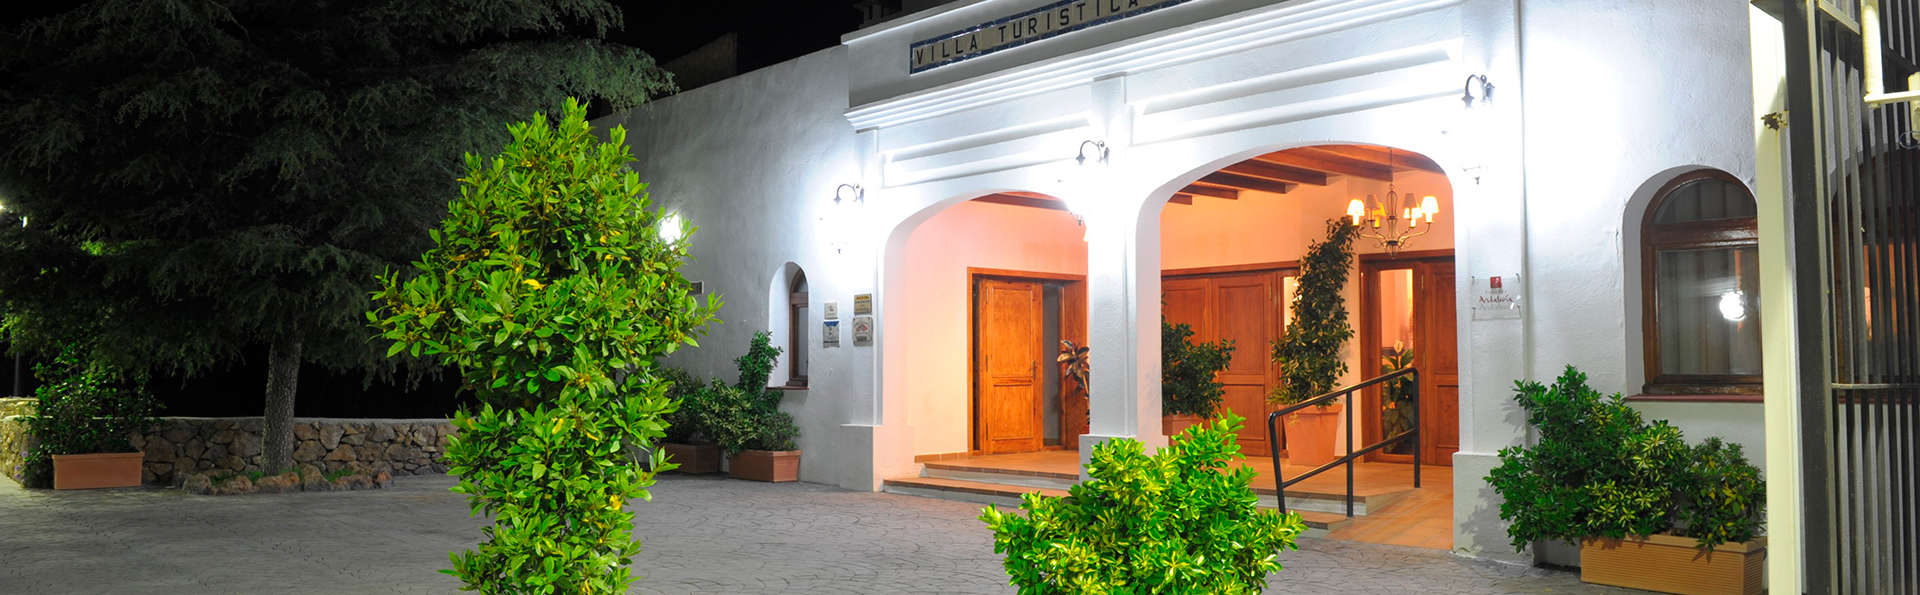 Villa Turística de Laujar de Andarax - EDIT_front.jpg